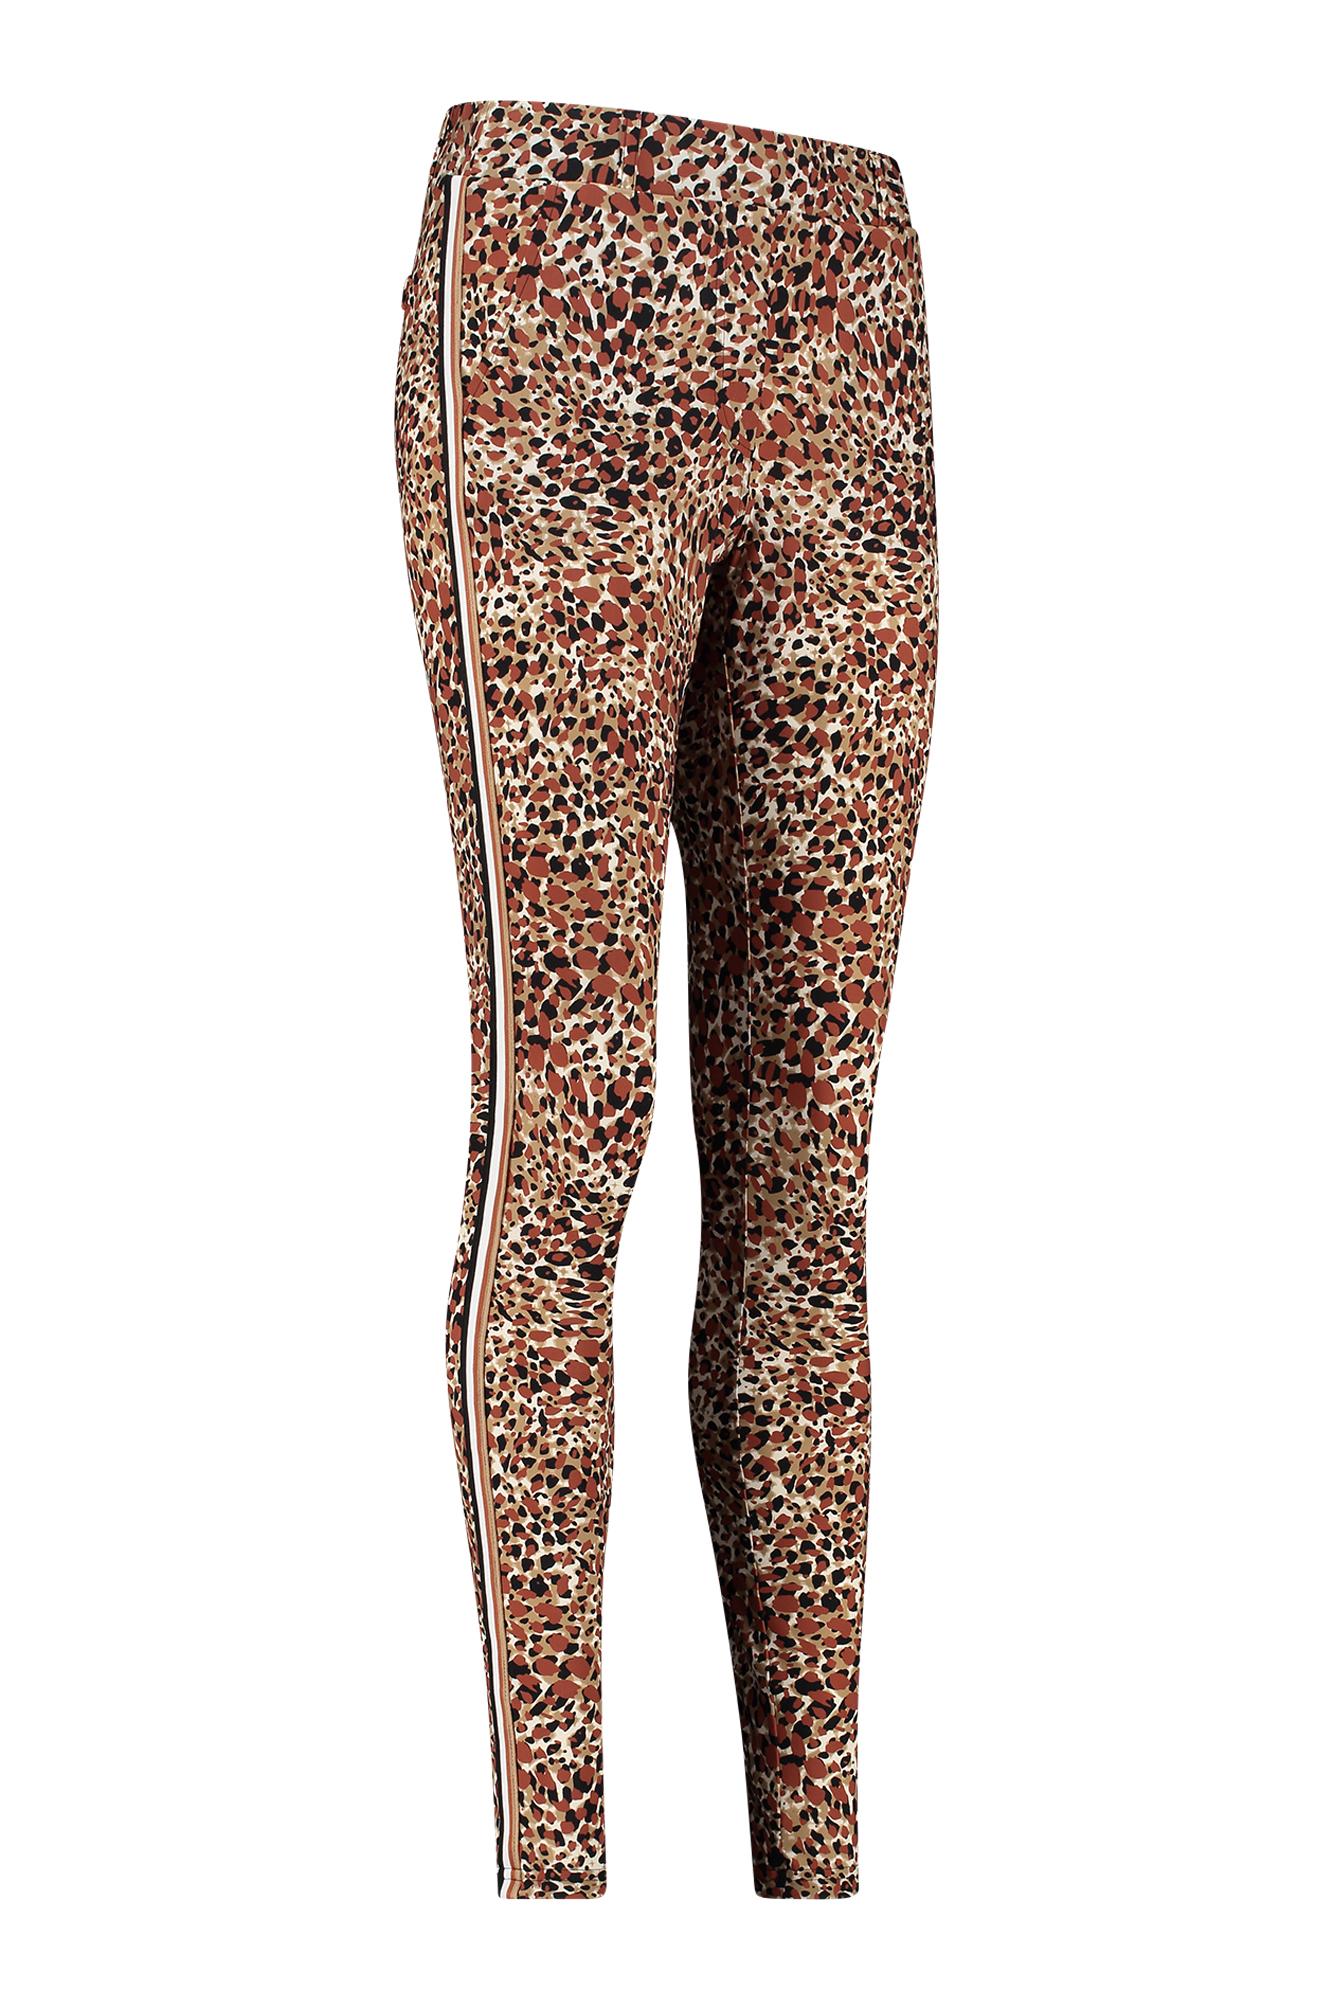 Flo animal trousers